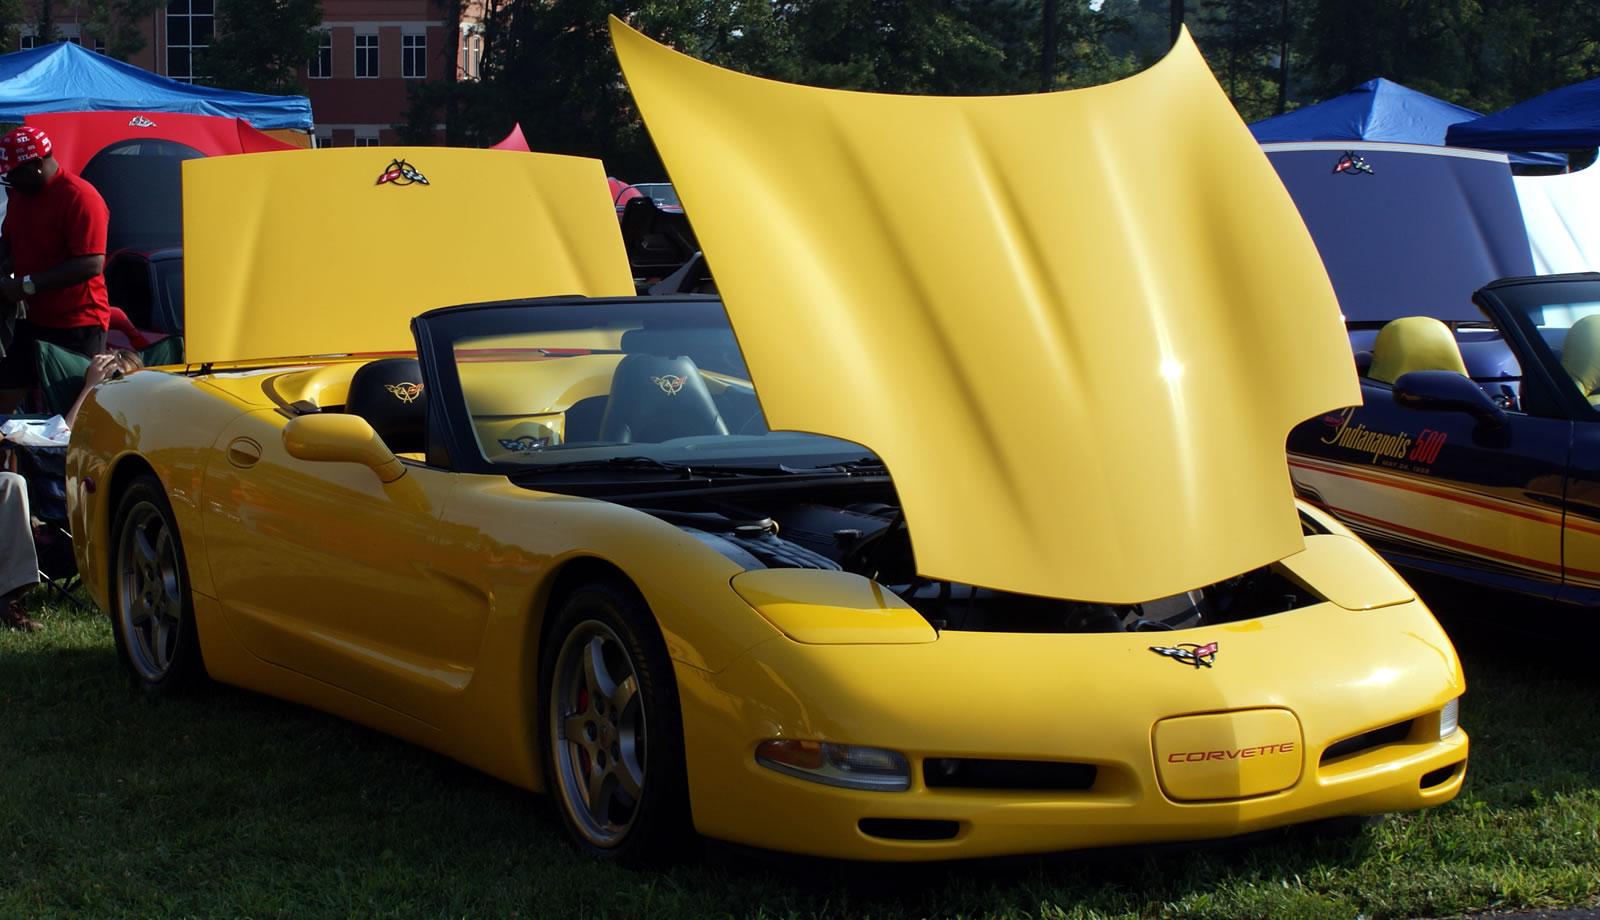 c5 f s 2000 millenium yellow convertible 6 speed corvette international. Black Bedroom Furniture Sets. Home Design Ideas